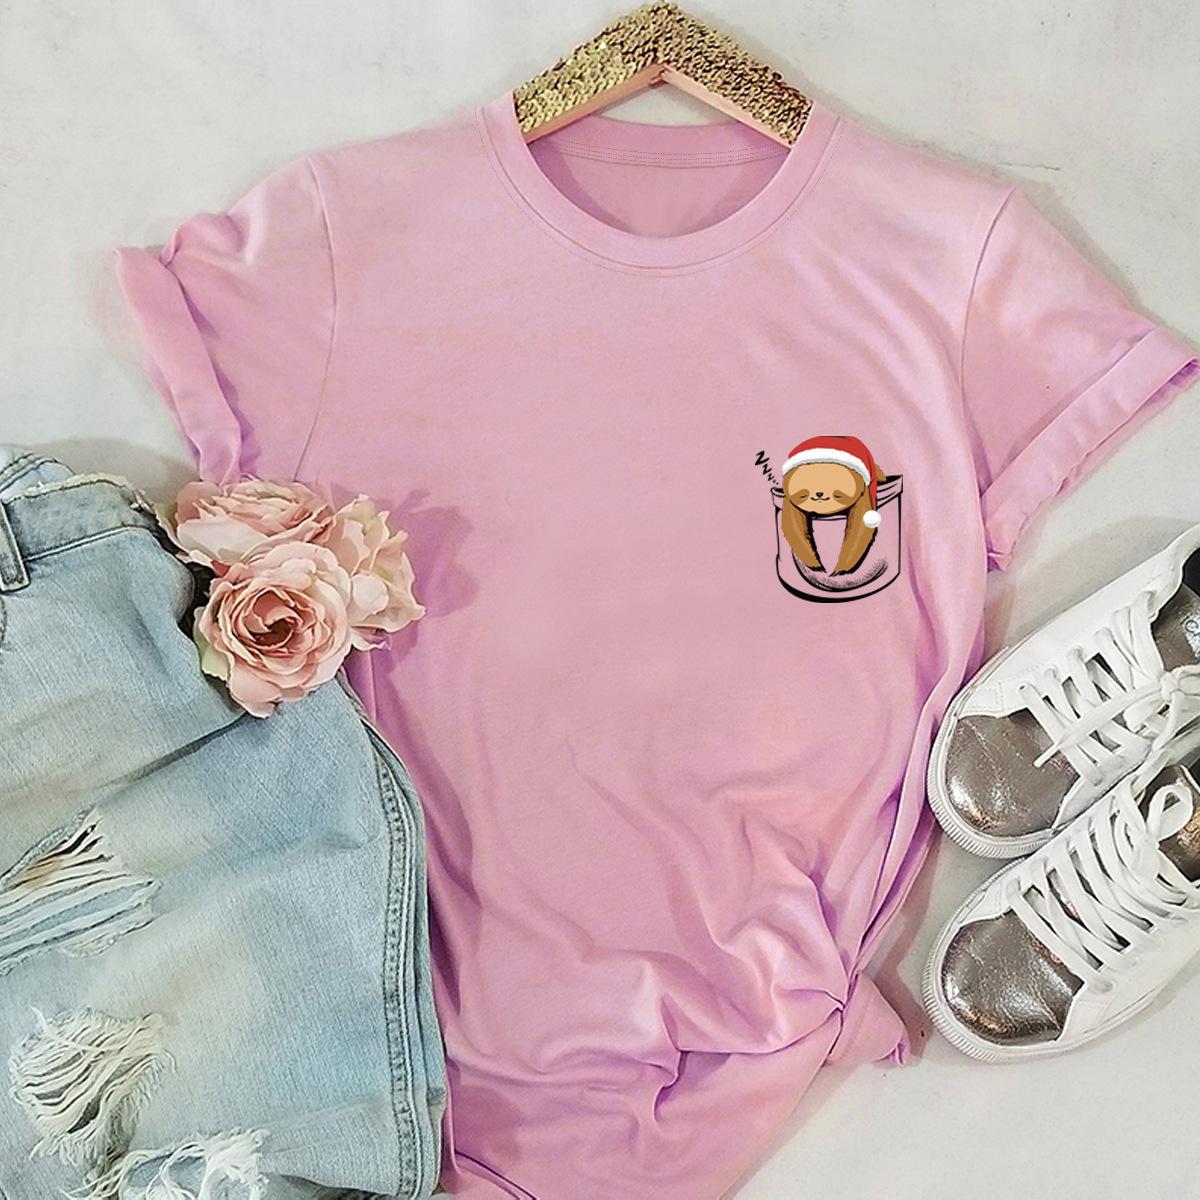 hot selling short-sleeved blouse Merry Christmas pocket sloth t-shirt NSSN2567